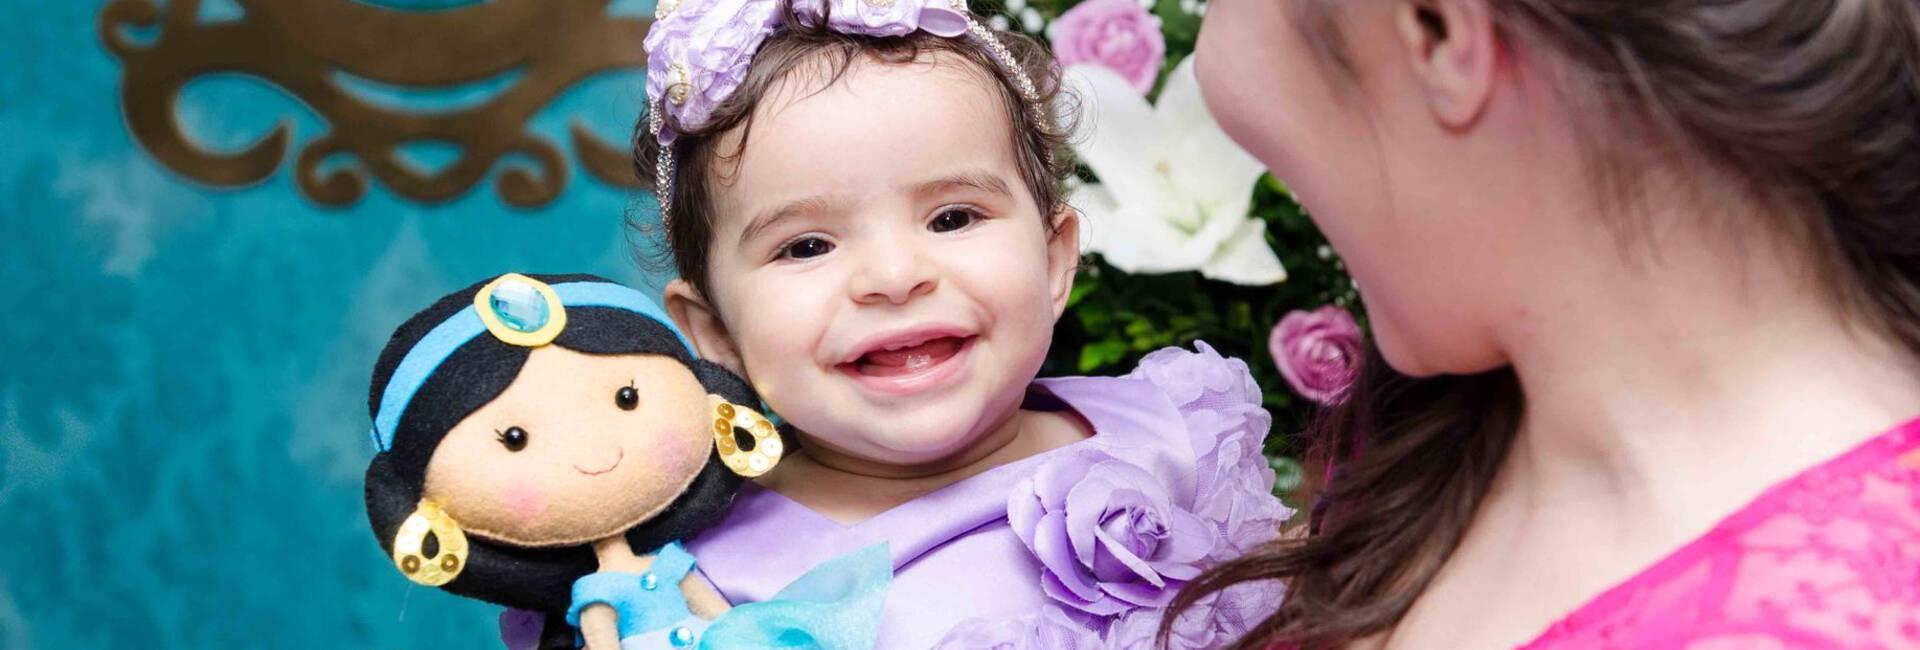 Aniversário Infantil de Antonella